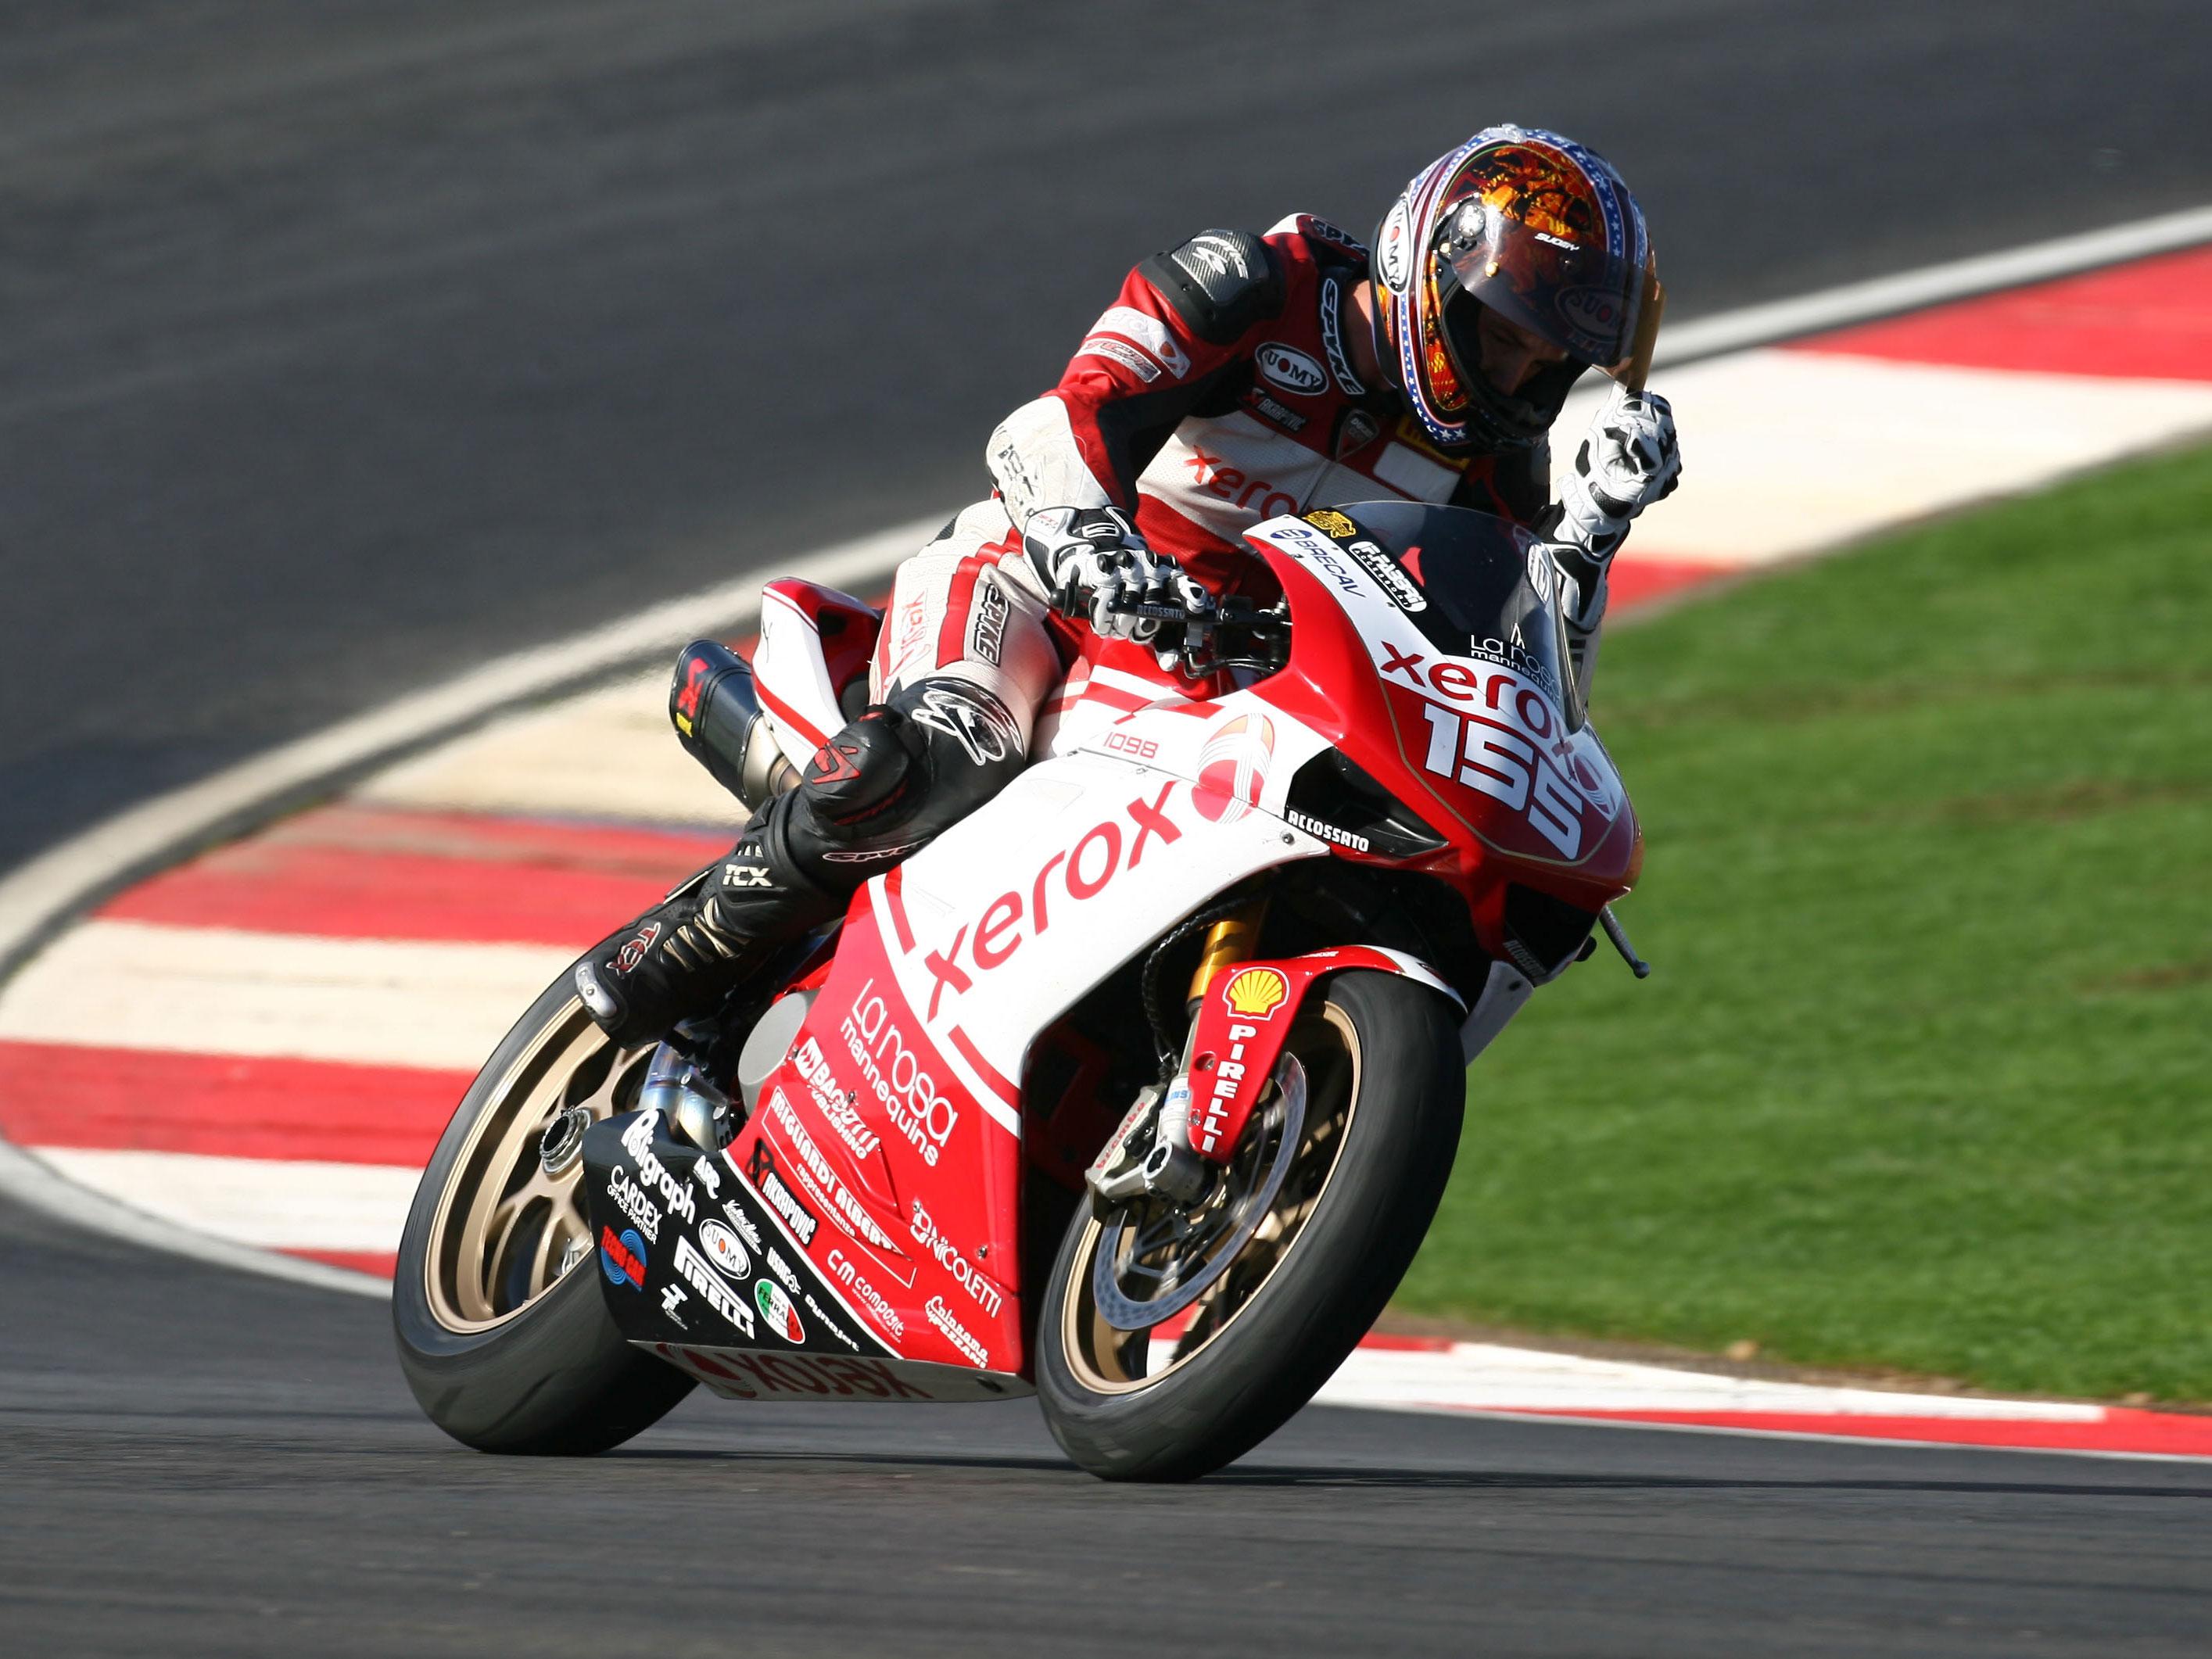 Roberts (Ducati), campeón de Superstock 1000